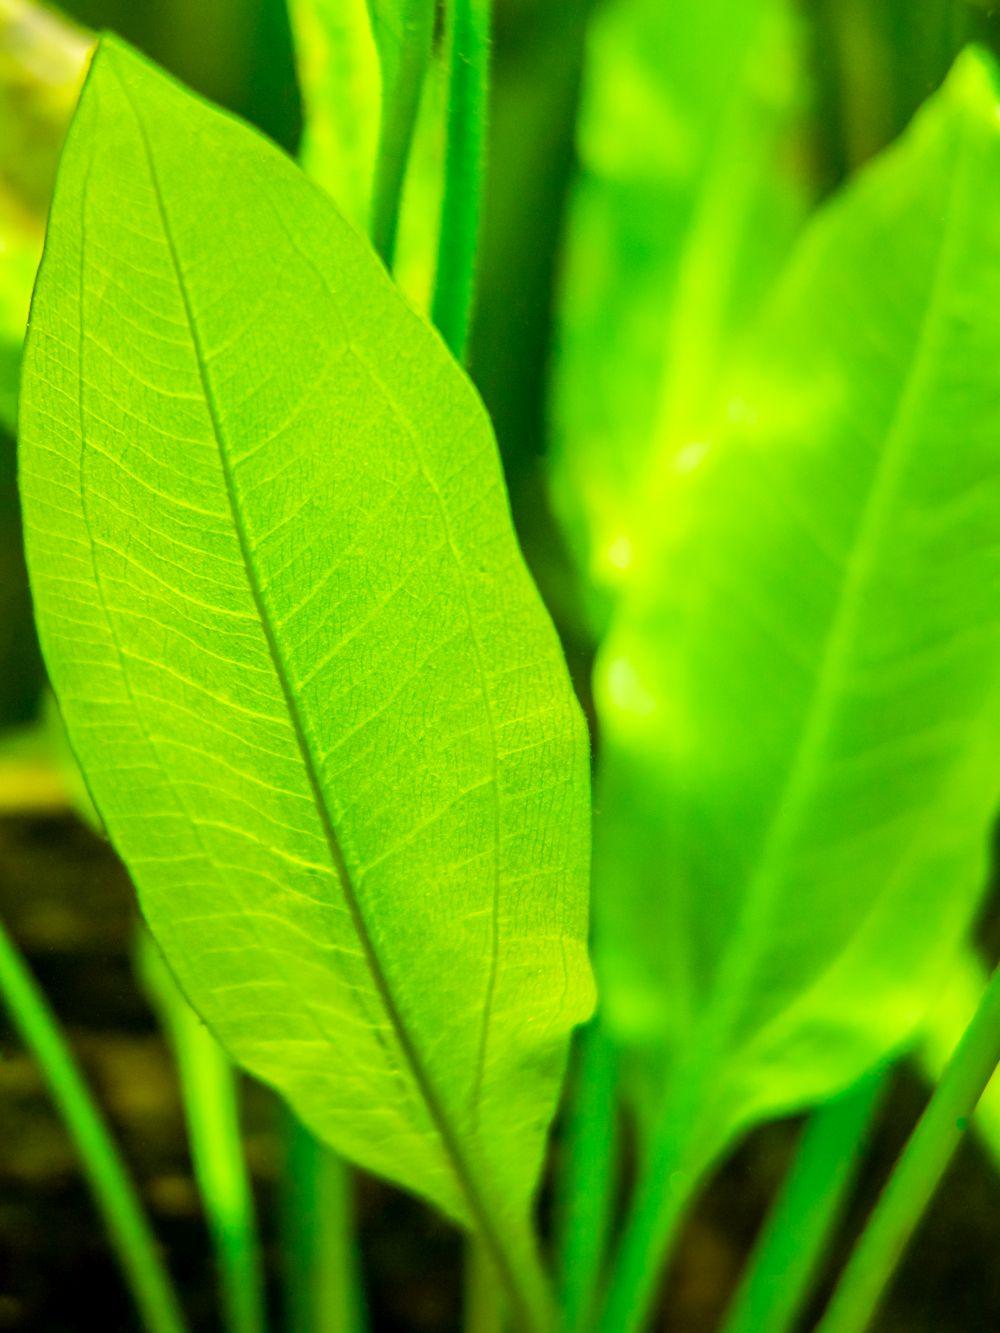 Amazon sword plant (echinodorus amazonicus) close up on a fish tank